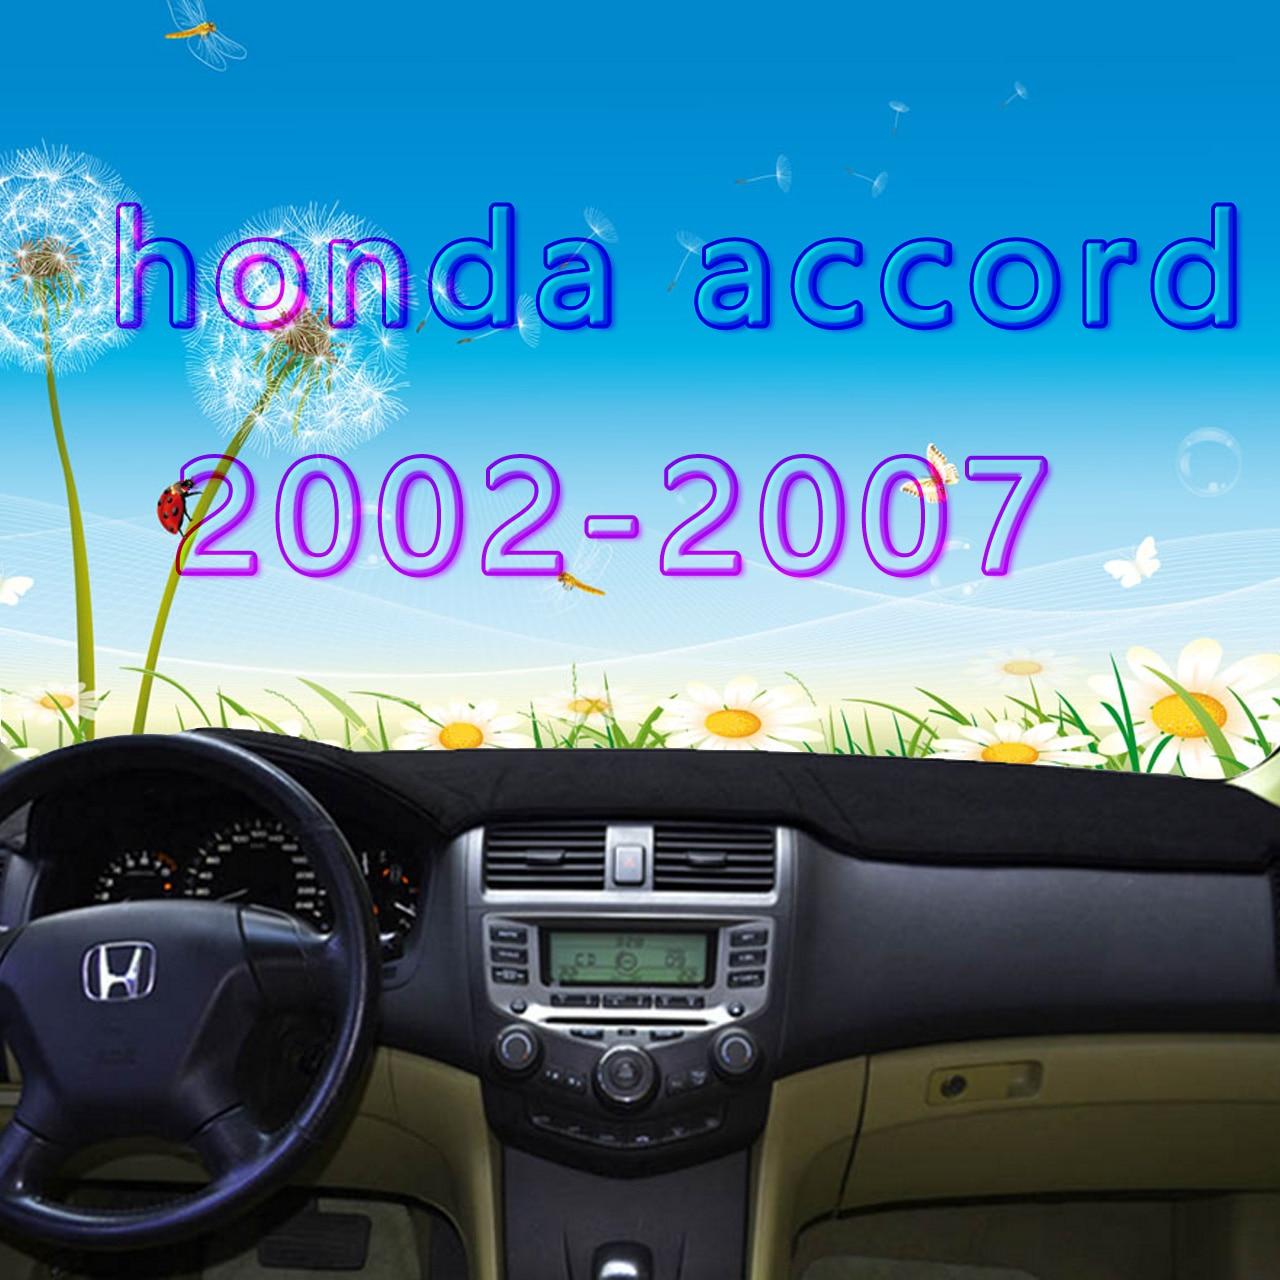 Honda Accord Car Covers Reviews